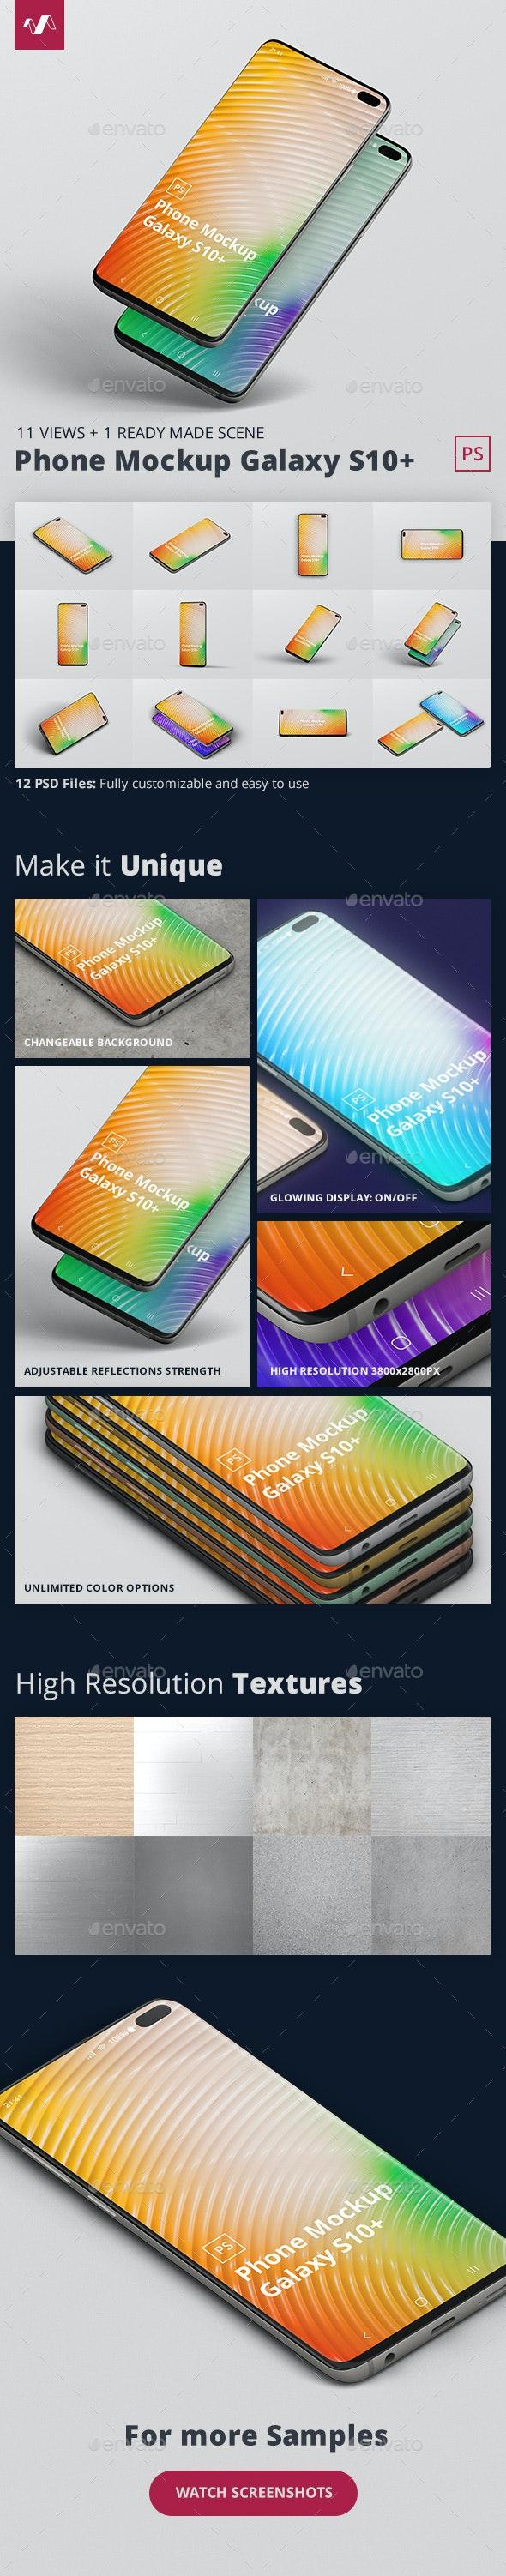 Phone Mockup Galaxy S10 Plus - Mobile Displays